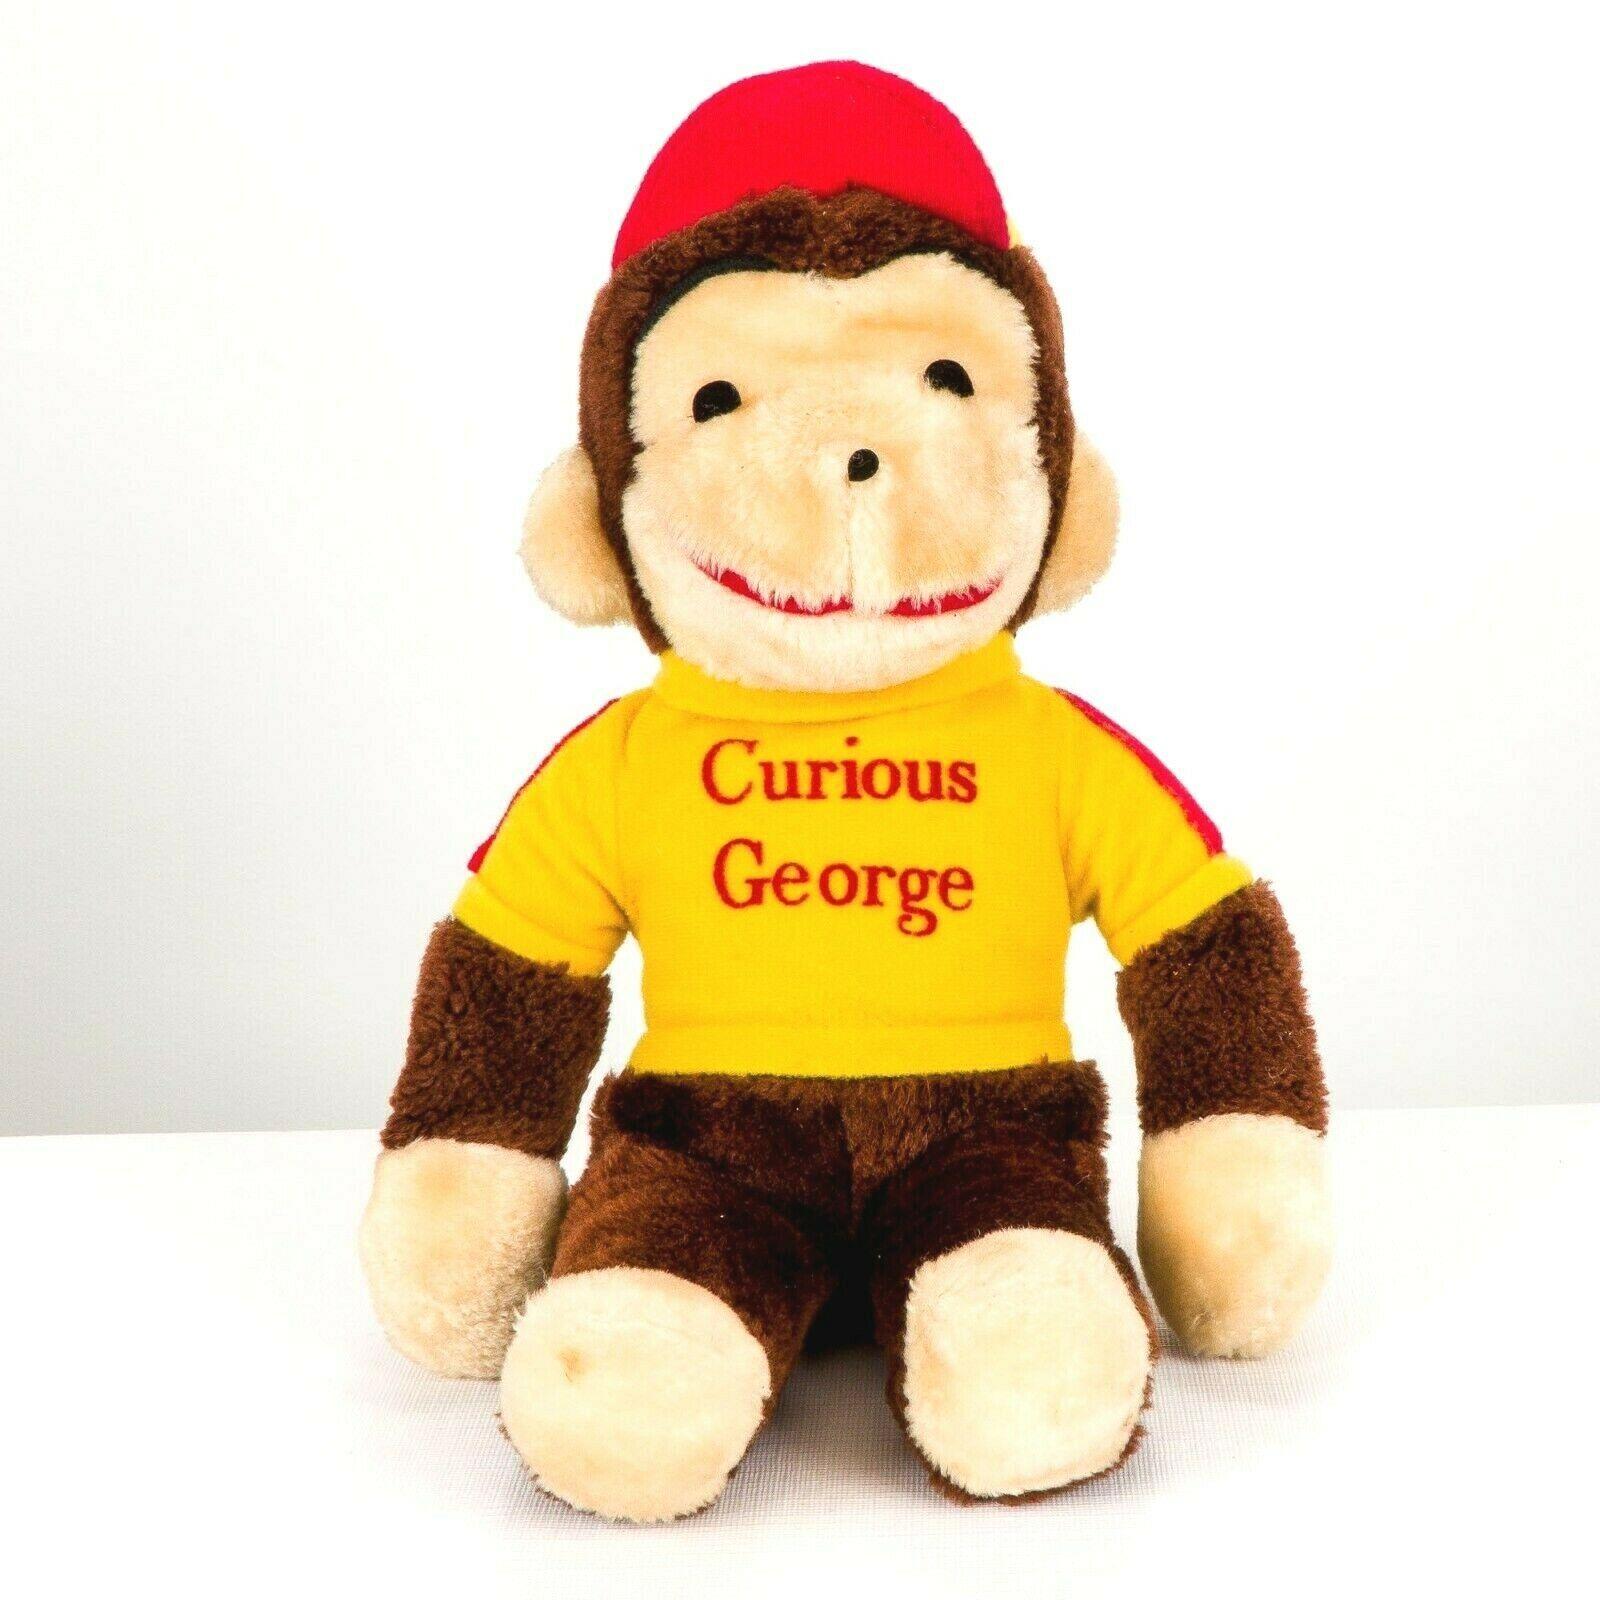 "Knickerbocker Curious George VTG Plush 14"" Monkey Yellow Shirt Stuffed Animal - $19.66"